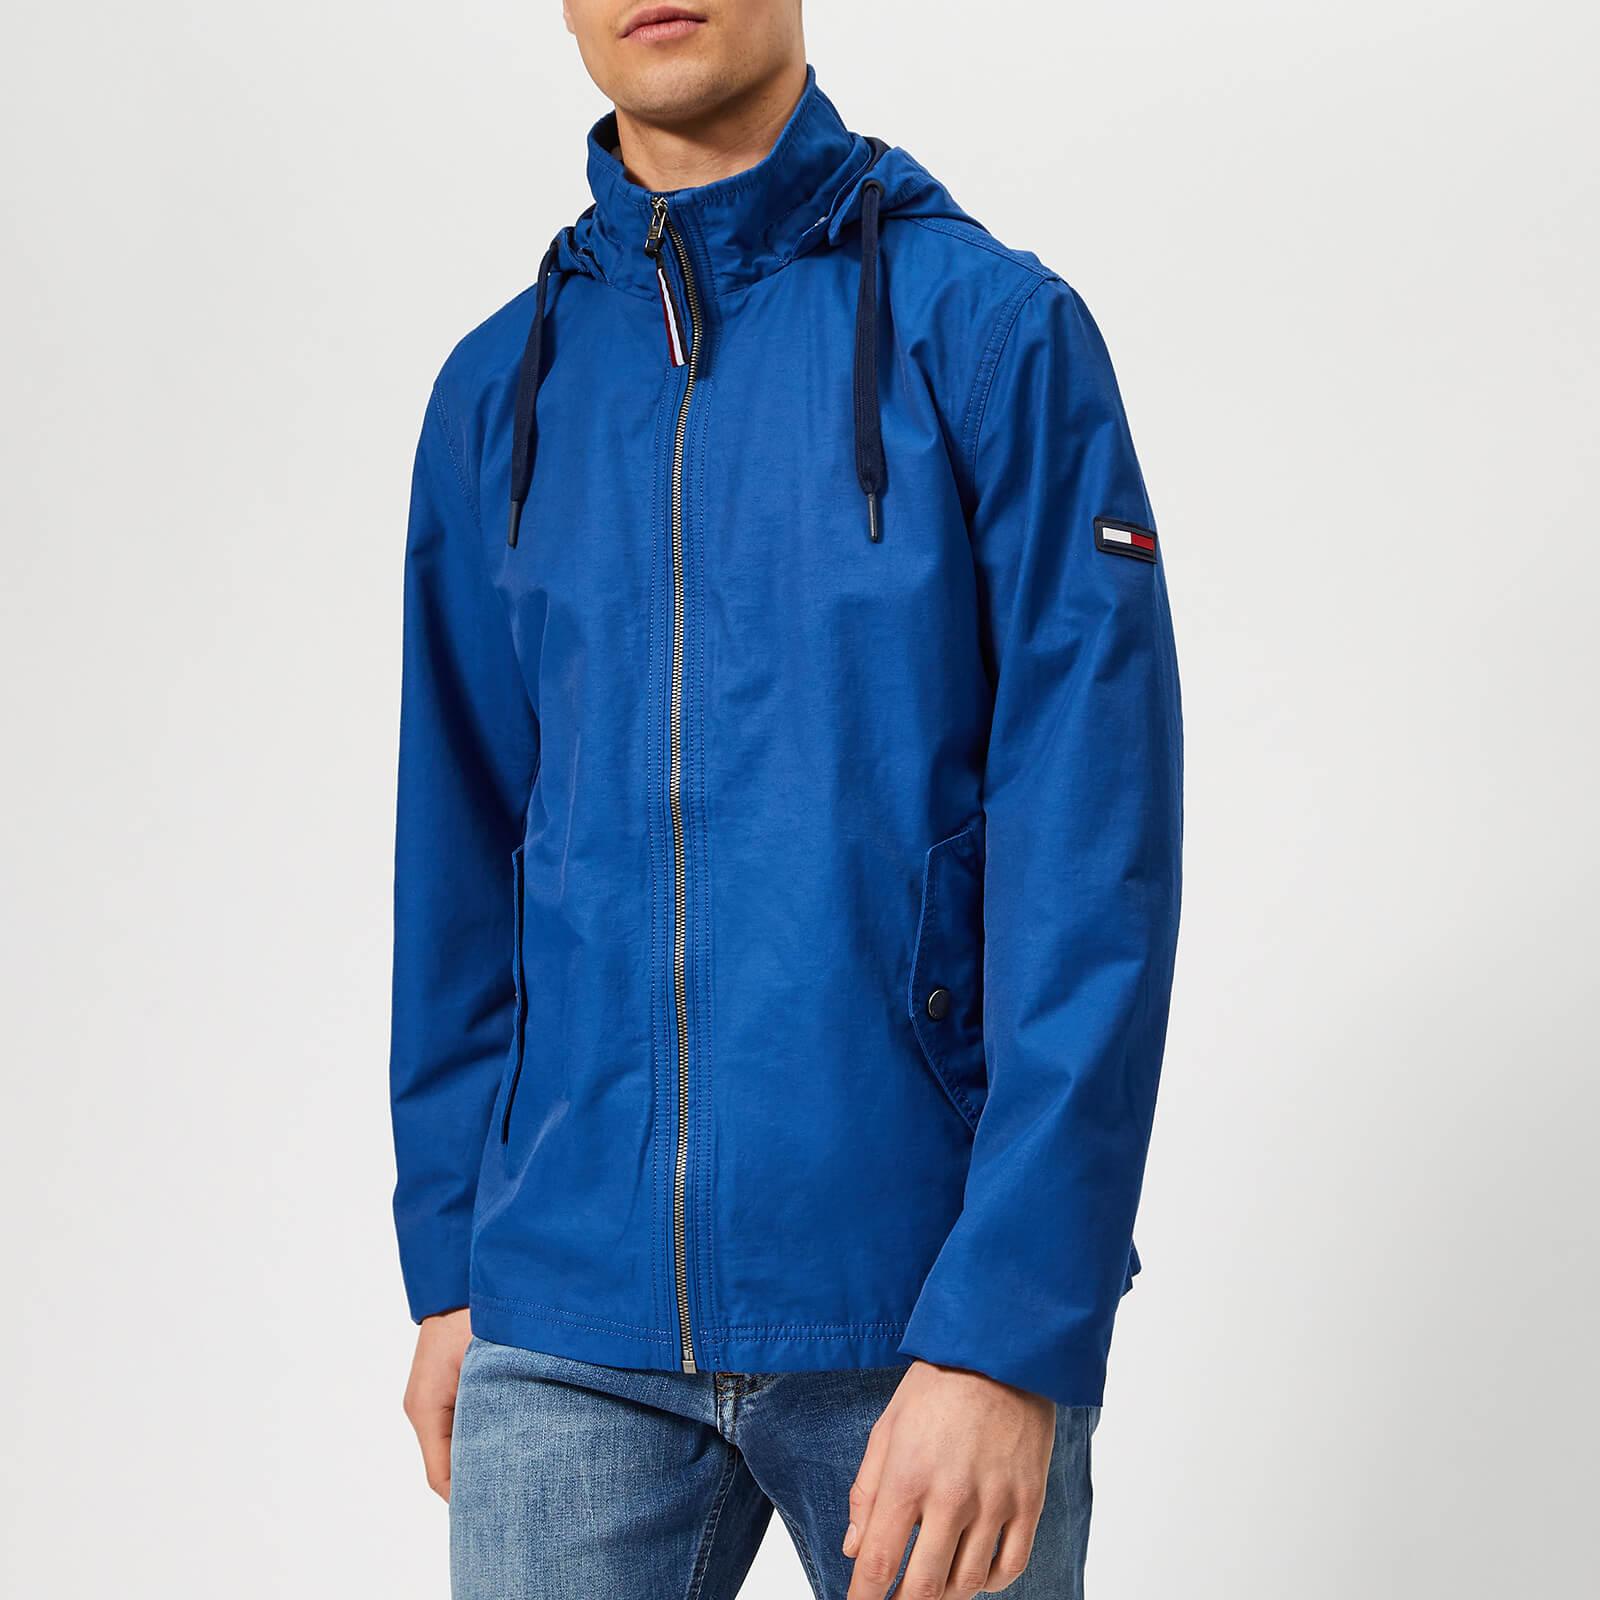 Tommy Jeans Men's Essential Hooded Jacket - Limoges - XL - Blue